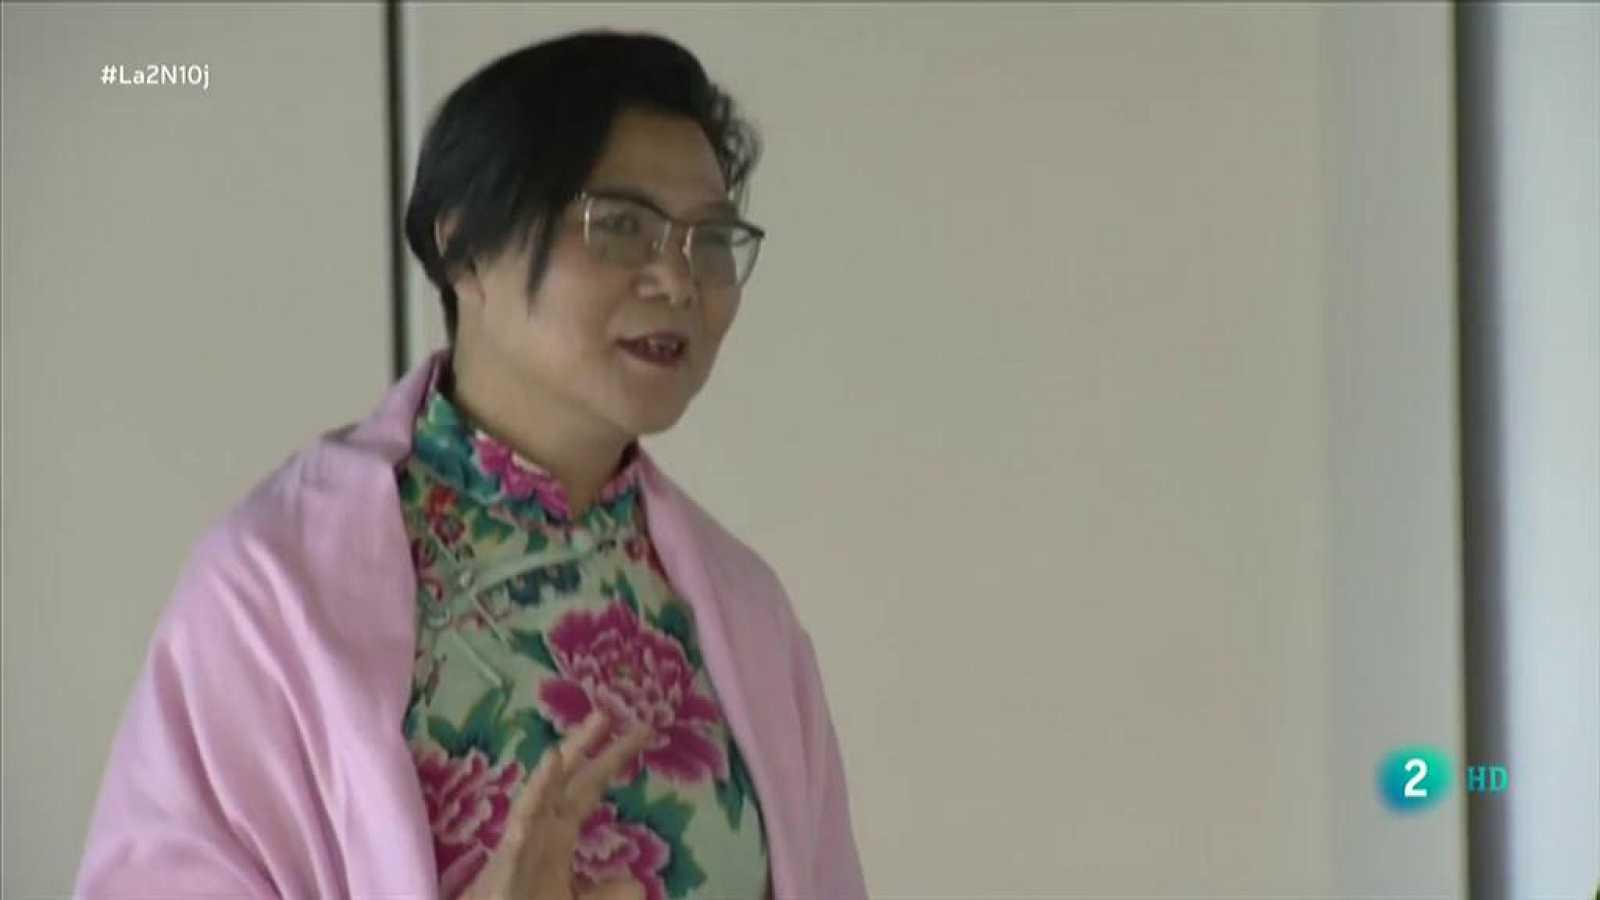 El feminismo en China